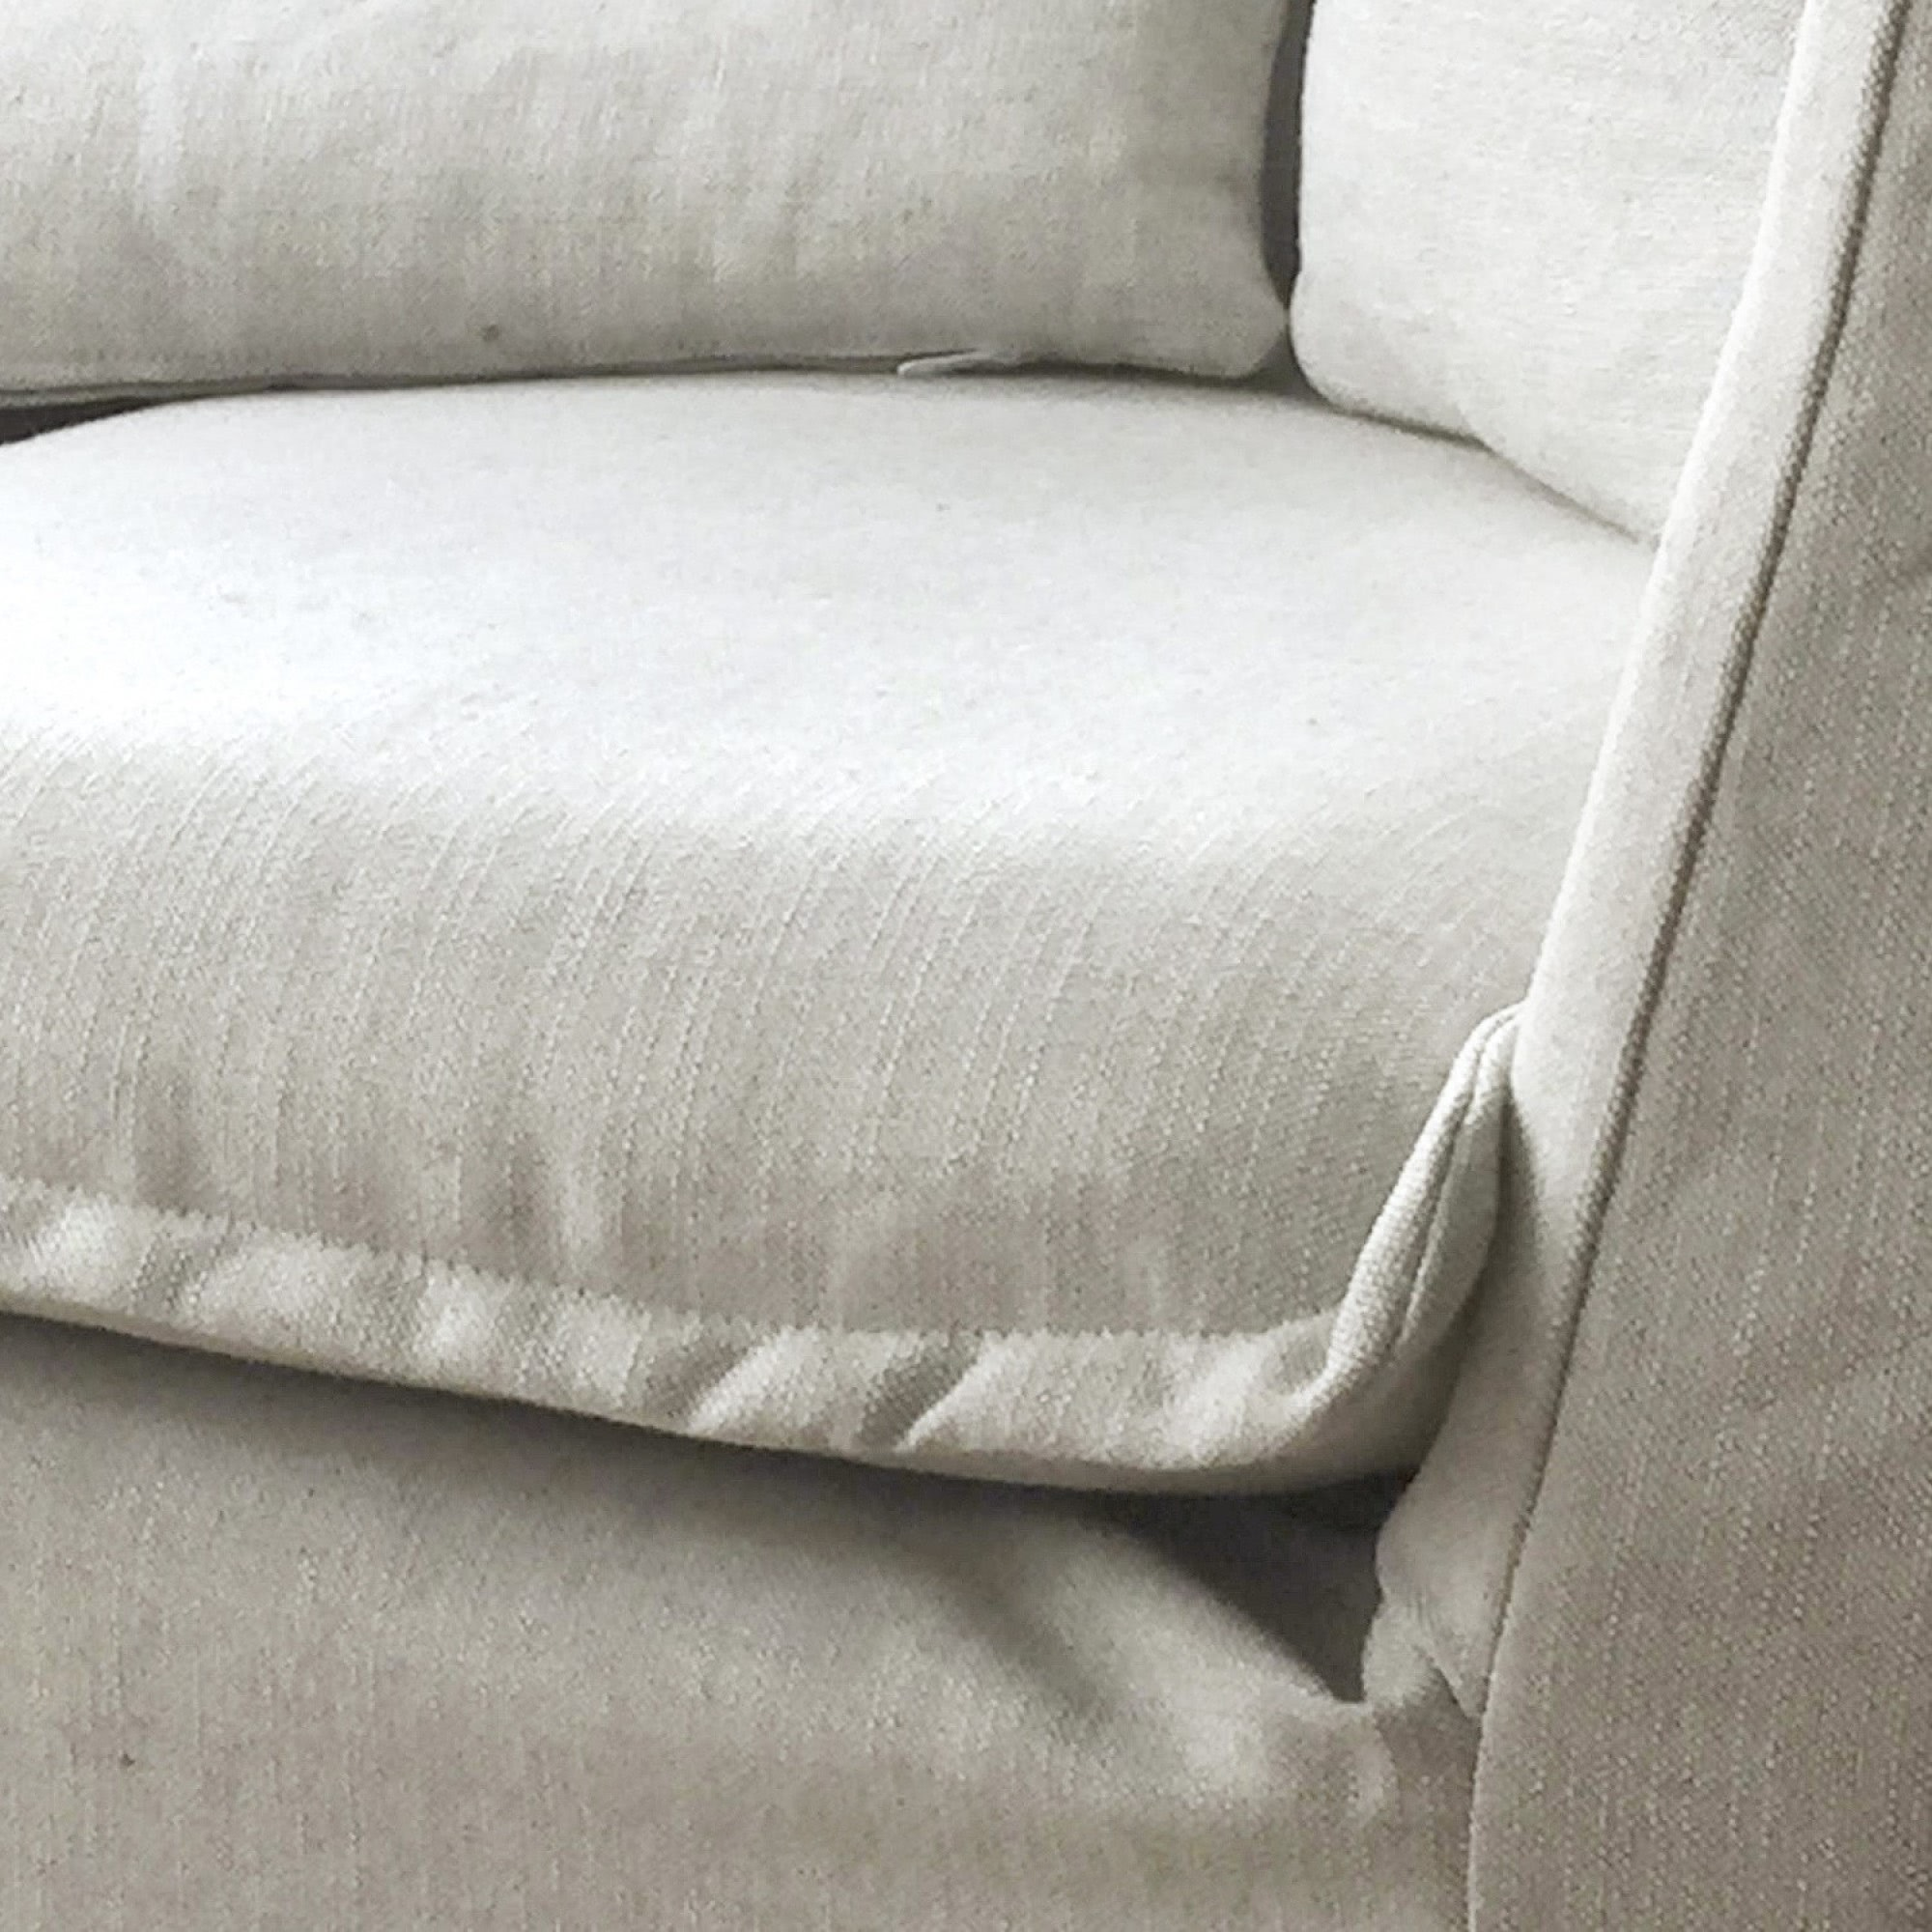 sofa abnehmbarer bezug 17 ikea klippan sofa u design divano kivik ikea sofa bezug waschbar m. Black Bedroom Furniture Sets. Home Design Ideas